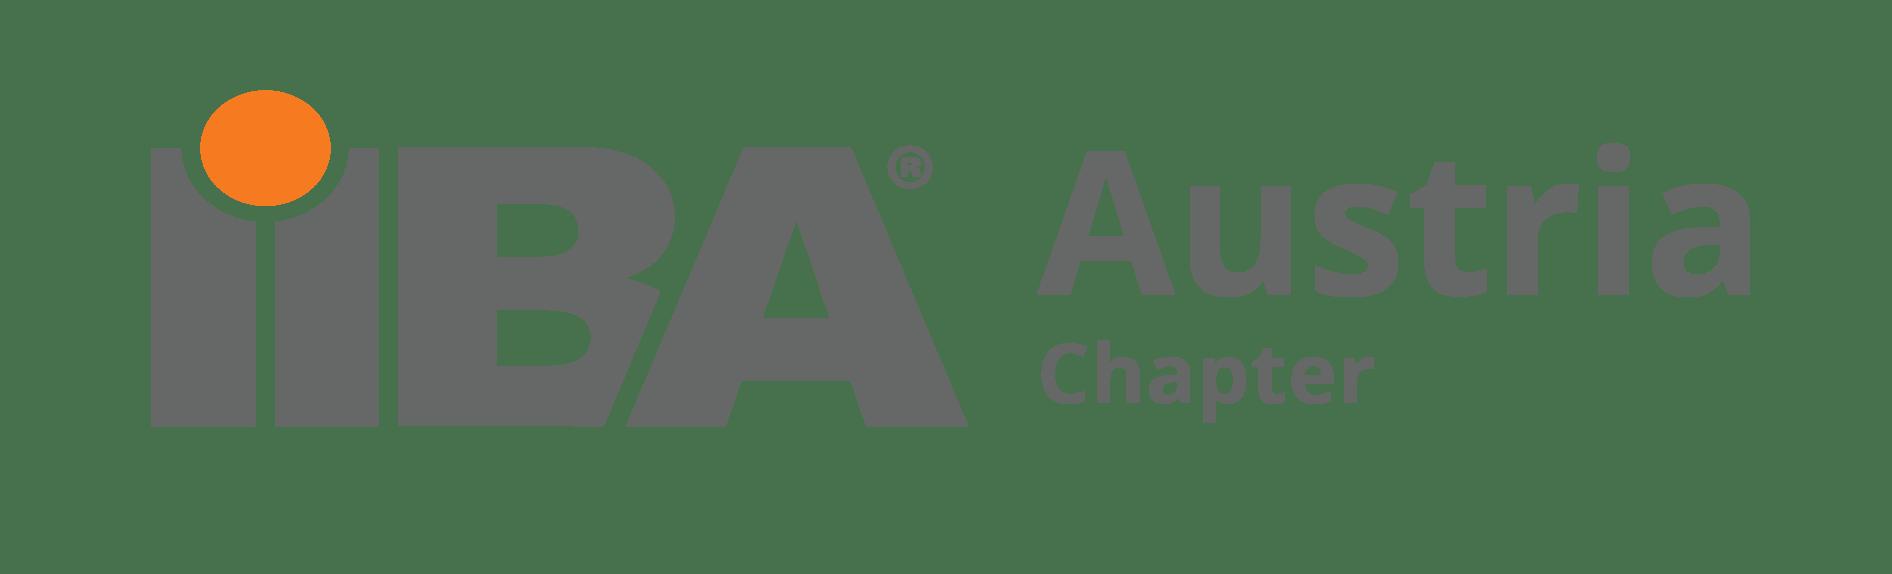 IIBA_Austria_Chapter